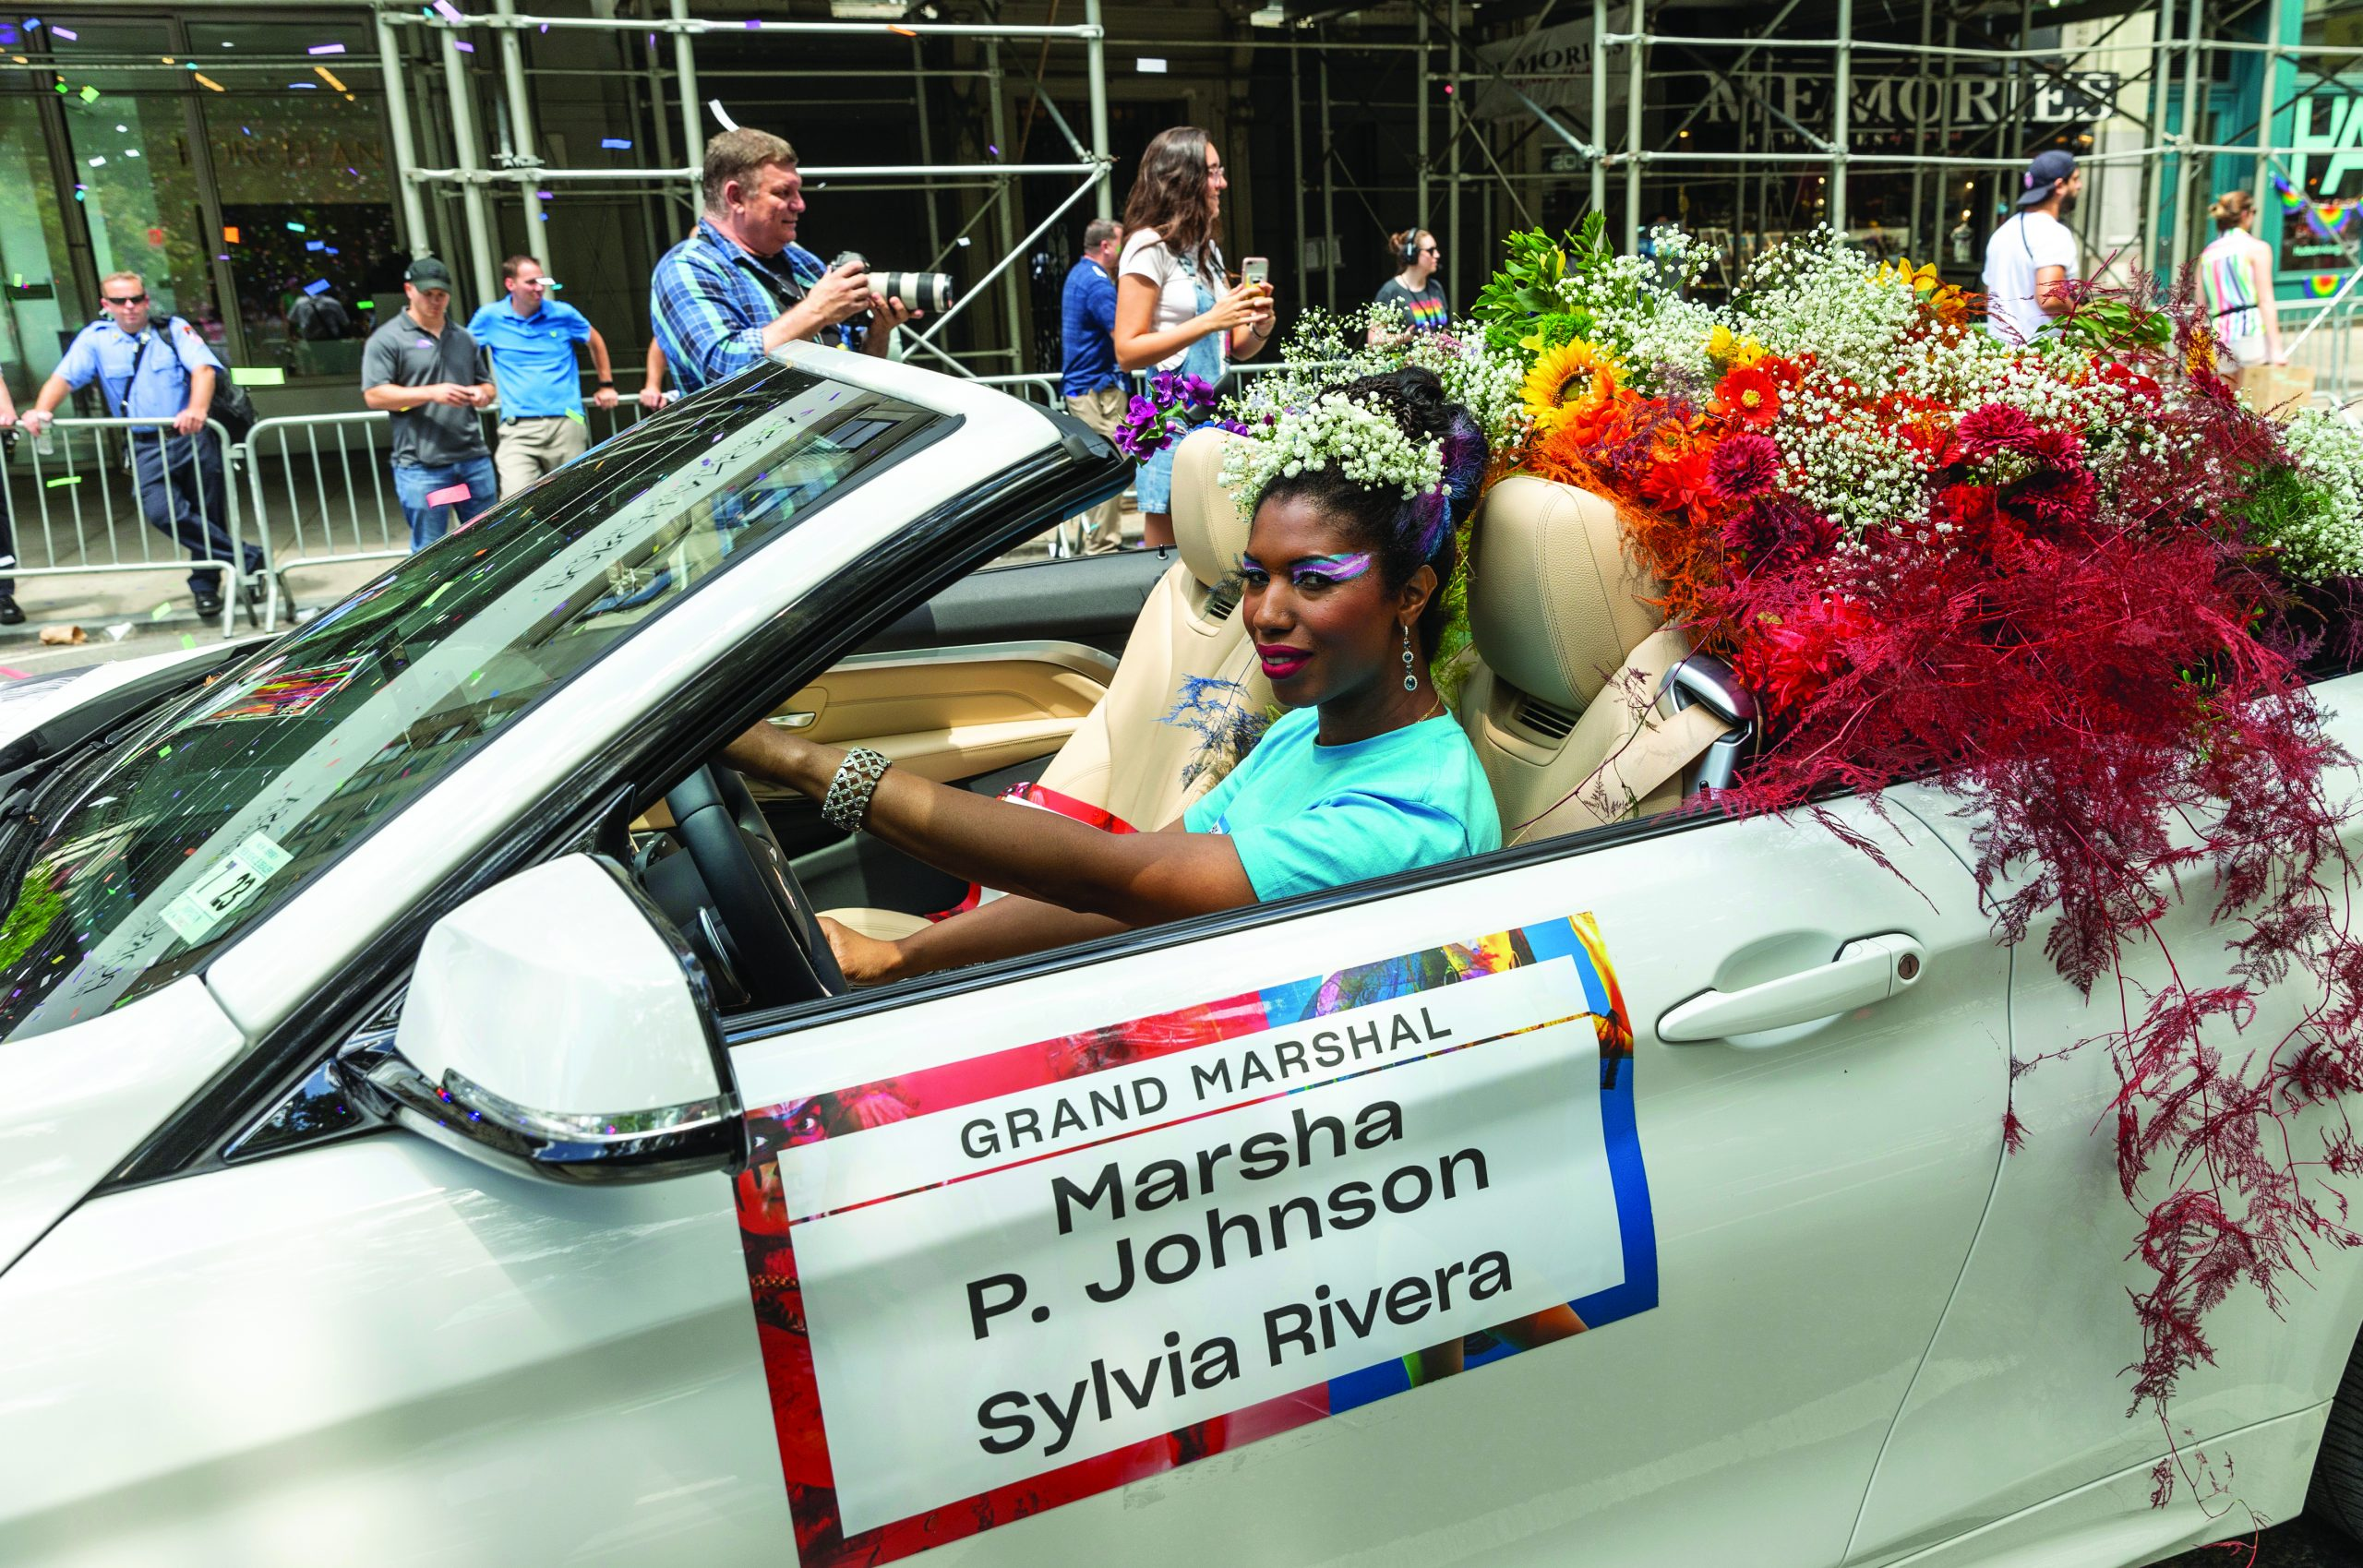 New York, NY - June 30, 2019: Grand Marshal Marsha P. Johnson attends New York 2019 Pride March on 5th Avenue in Manhattan